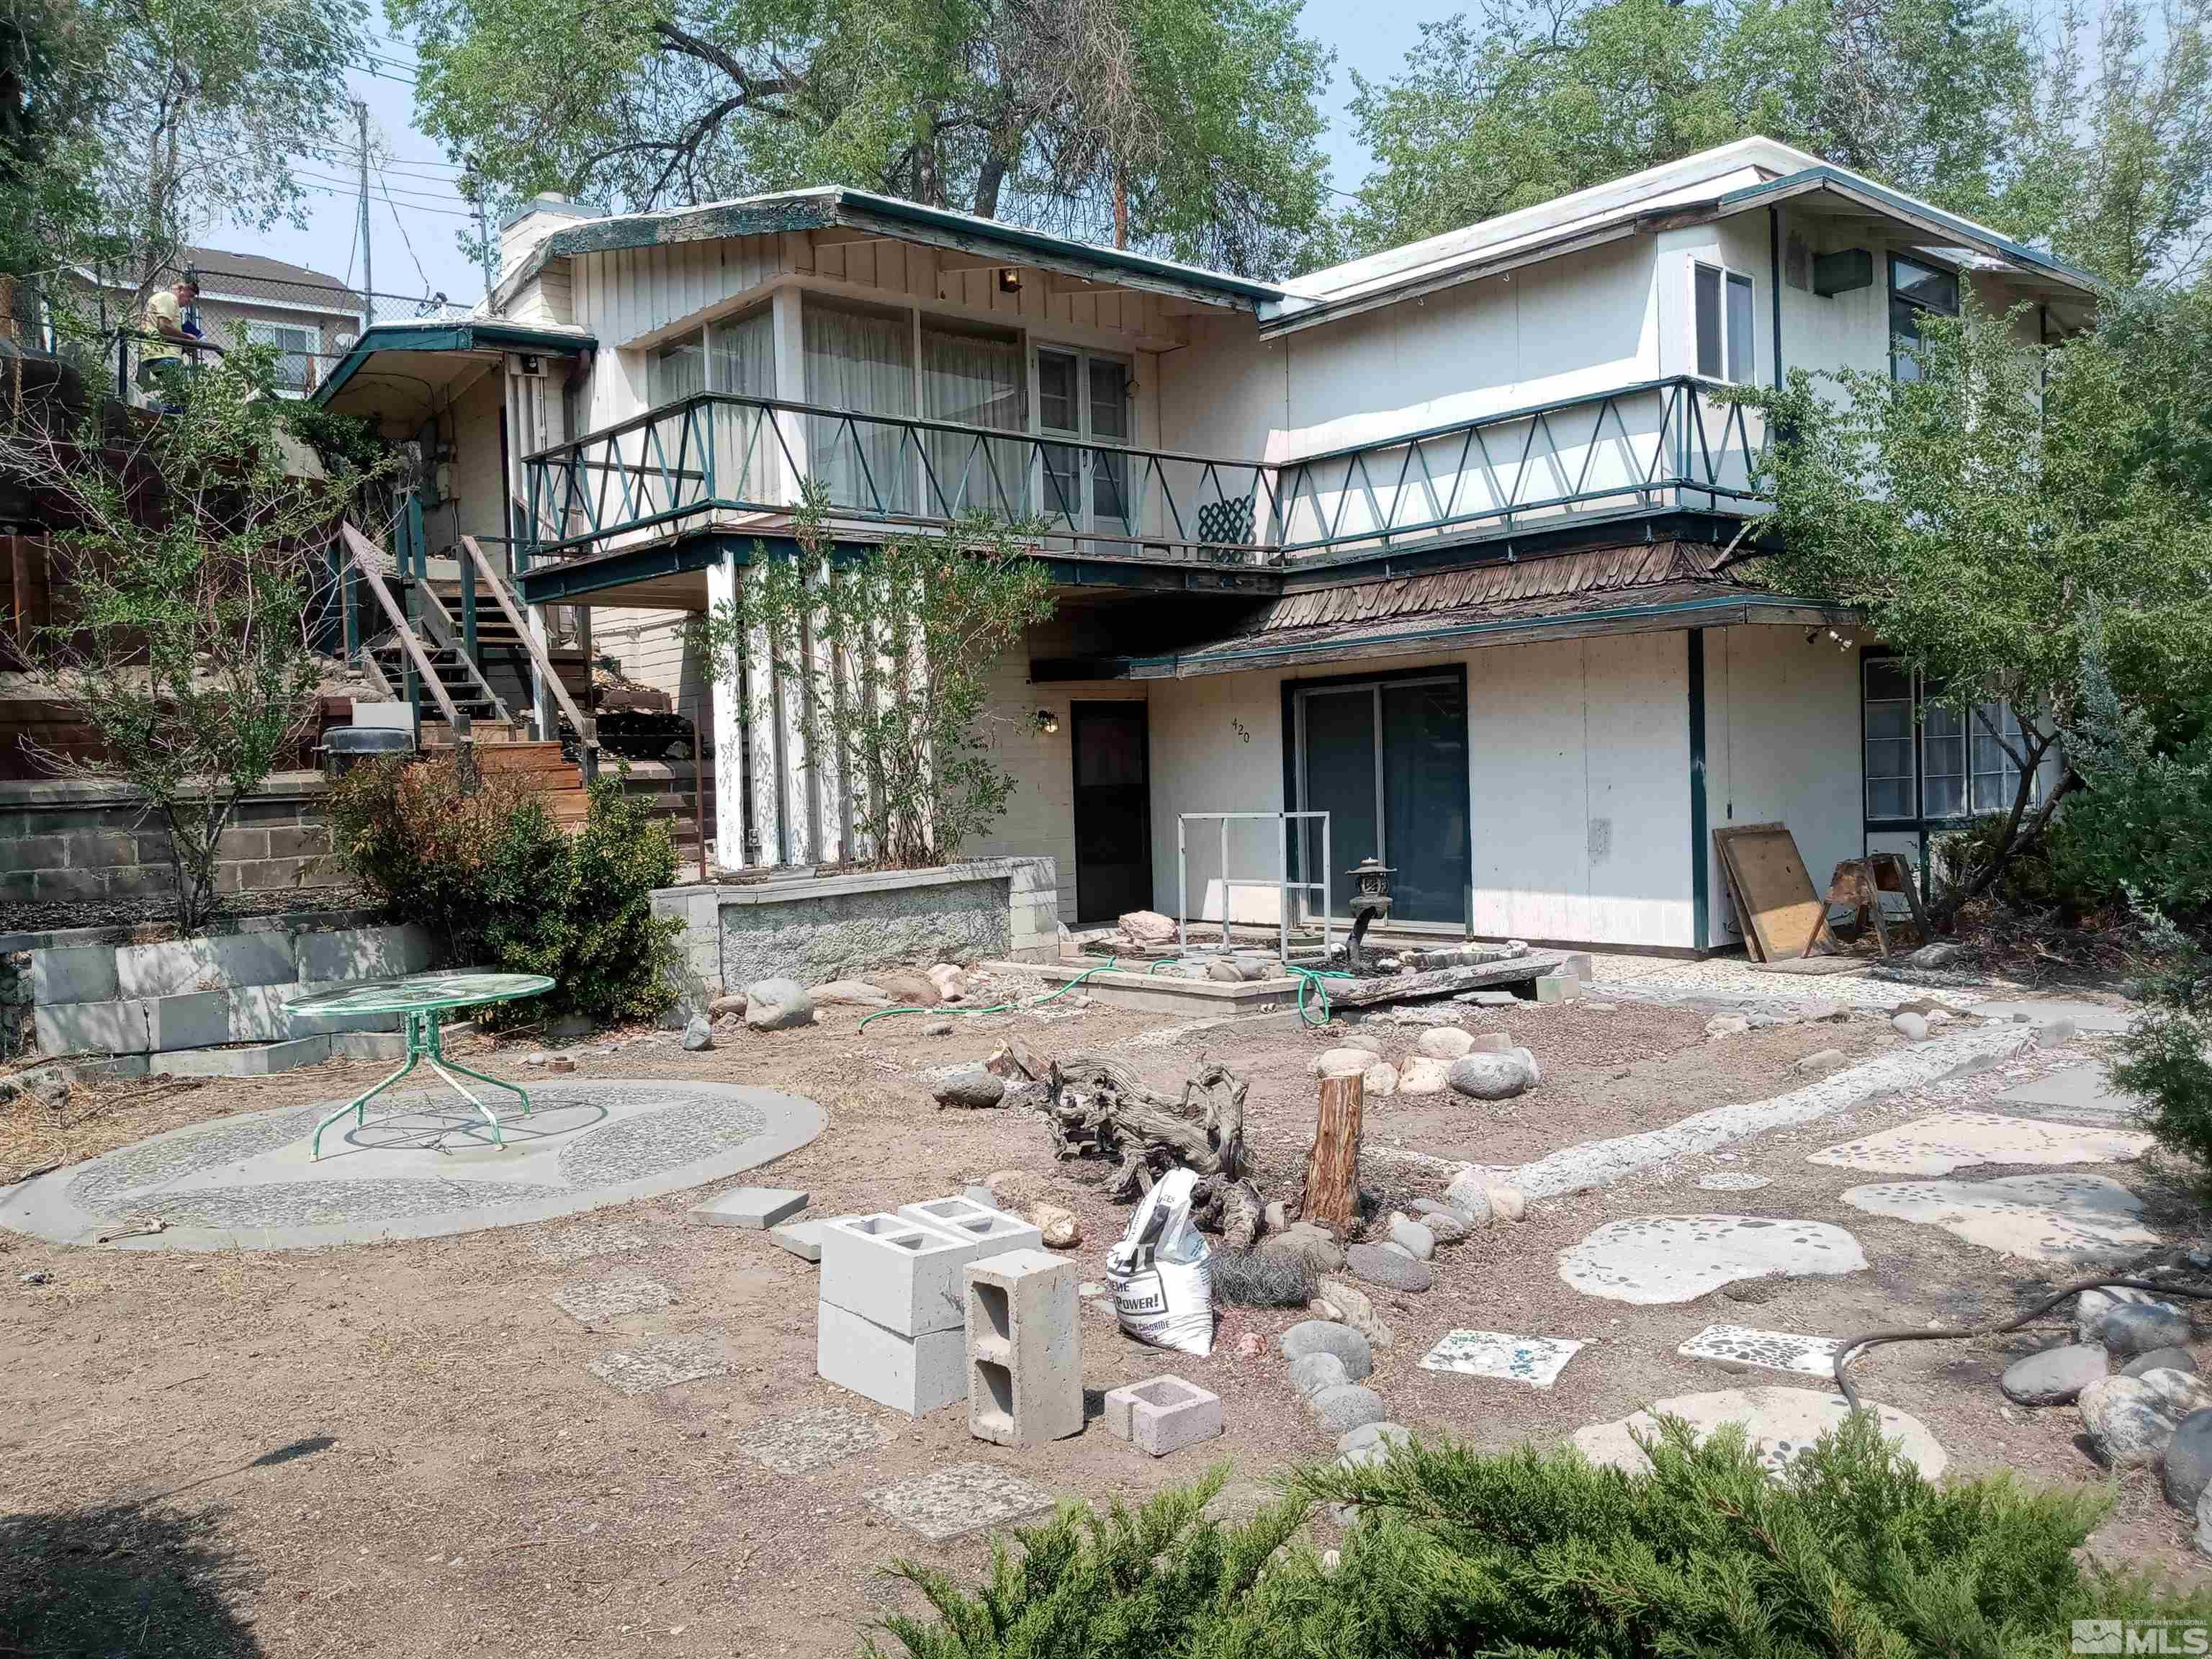 Image for 400 Minerva, Reno, NV 89503